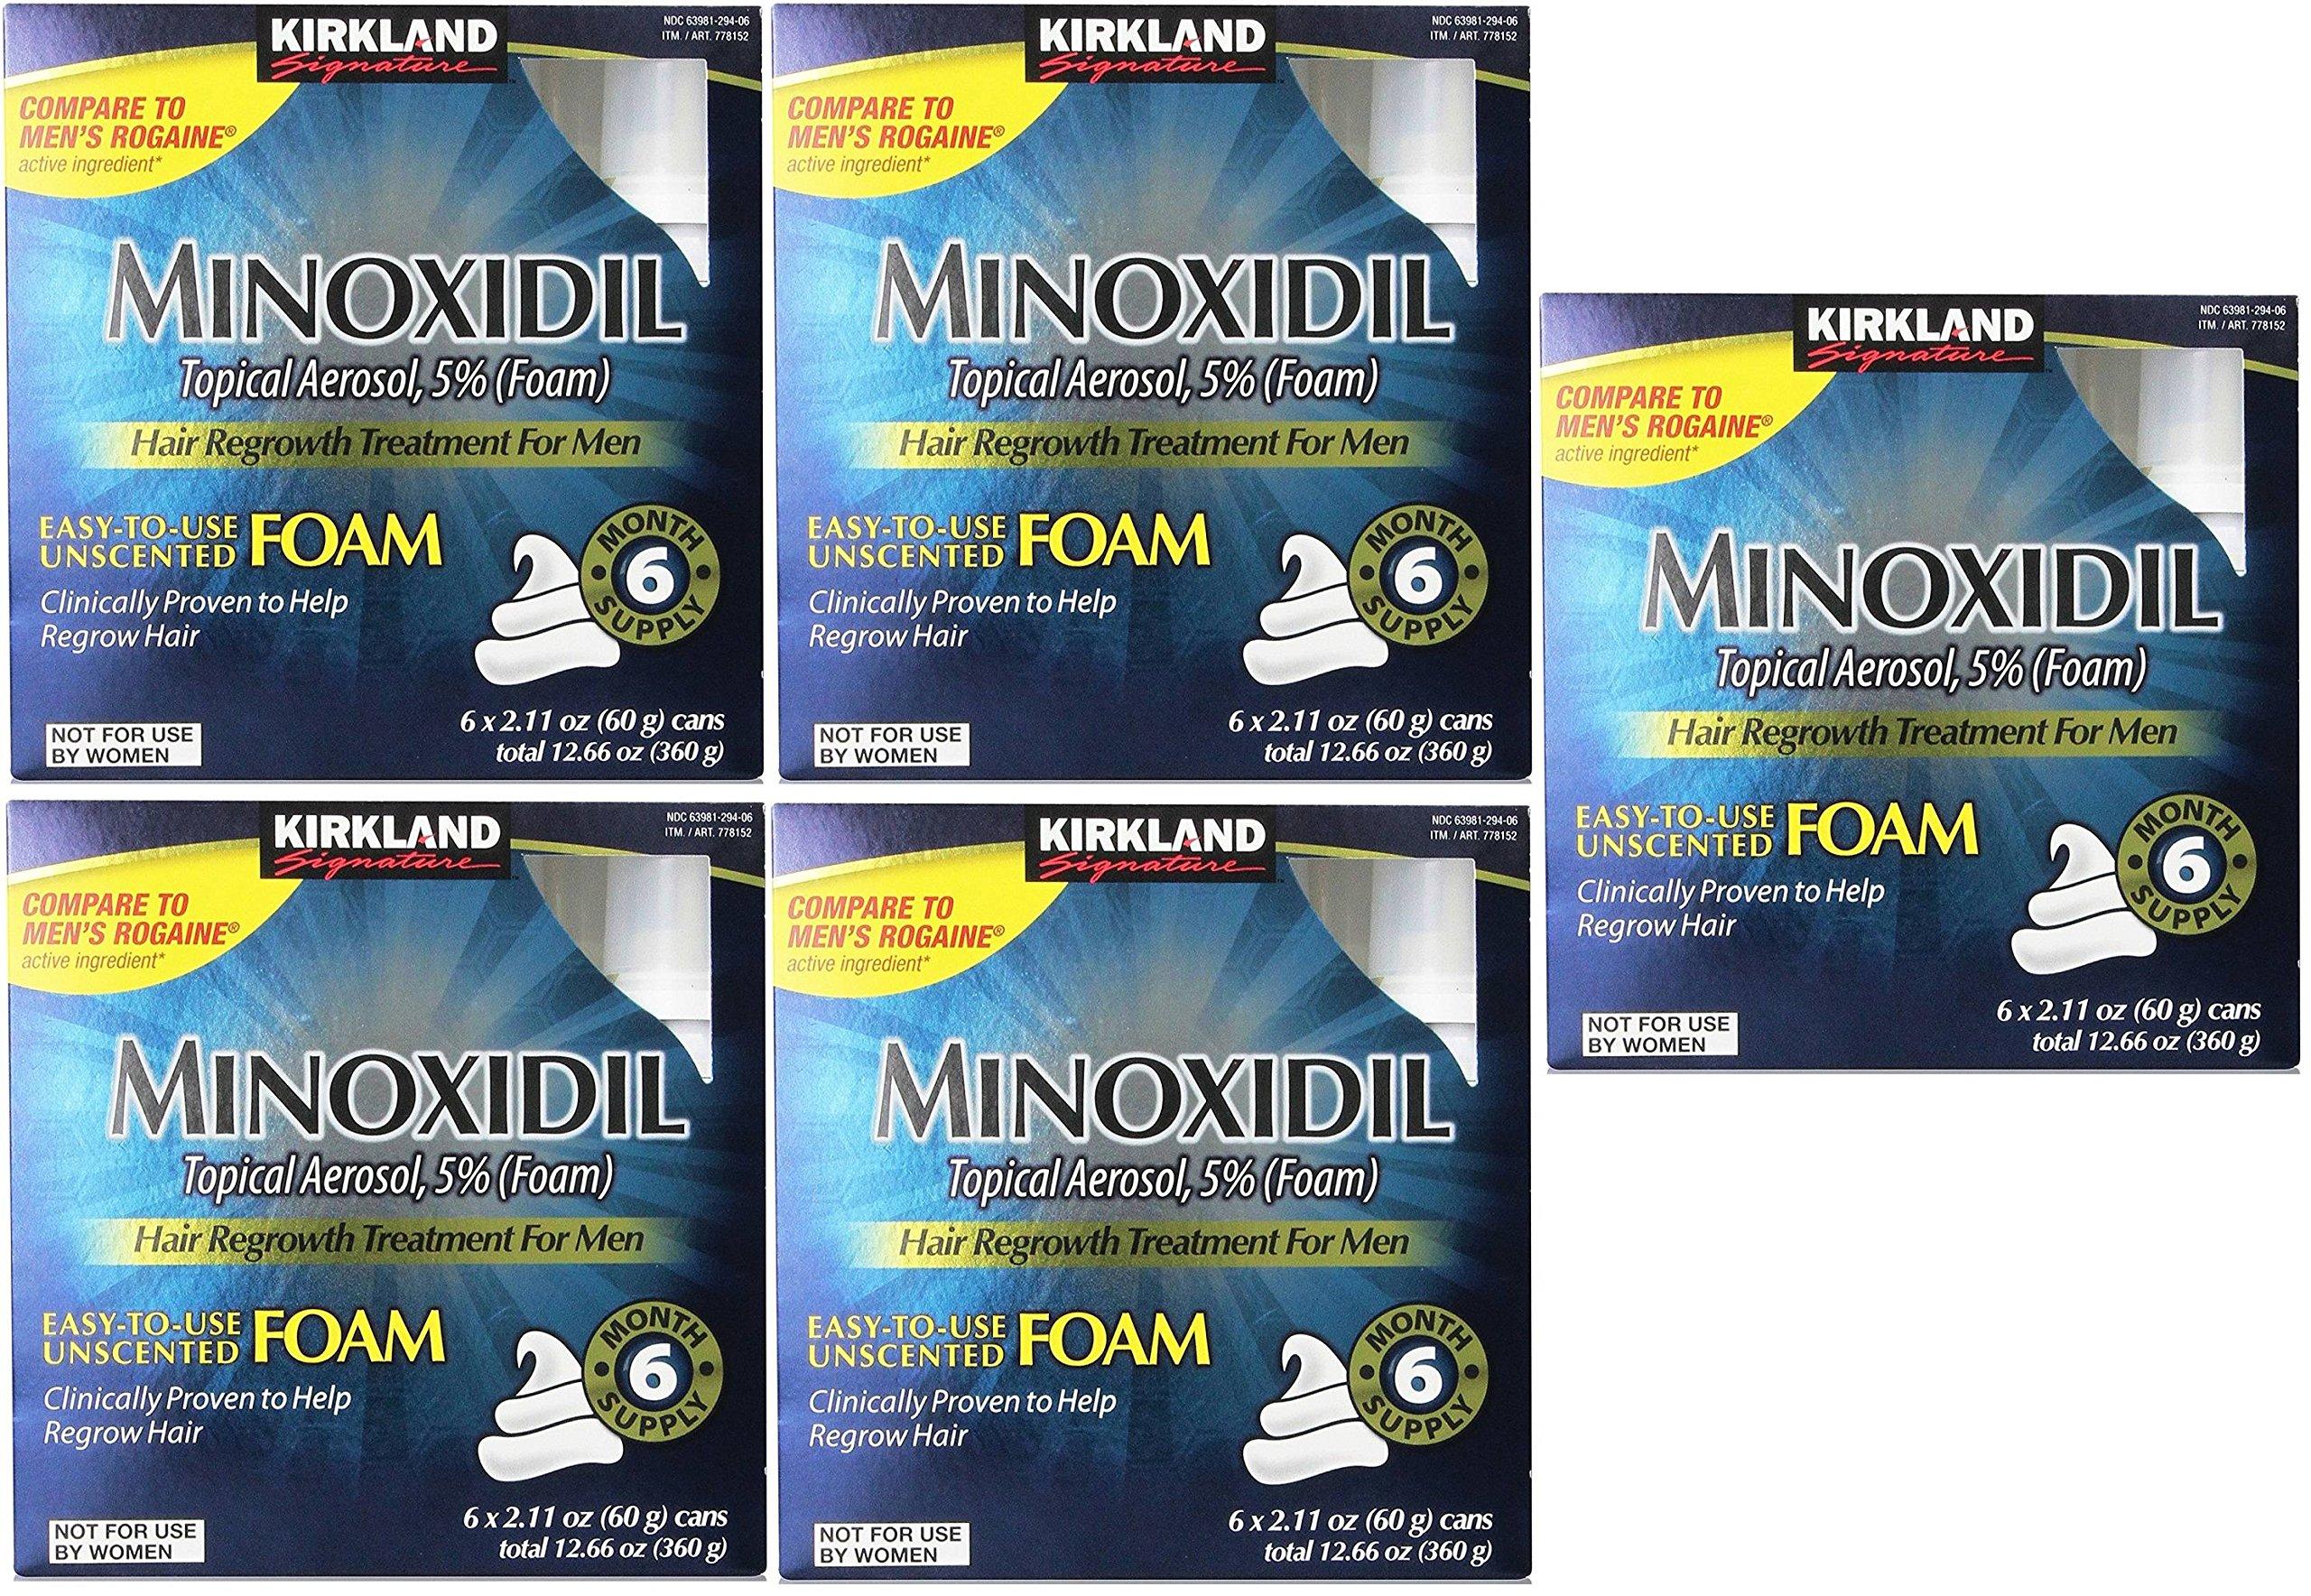 Kirkland Signature SXKUts Minoxidil Foam for Men, 12.6 oz, 6 Month Supply (5 Pack)